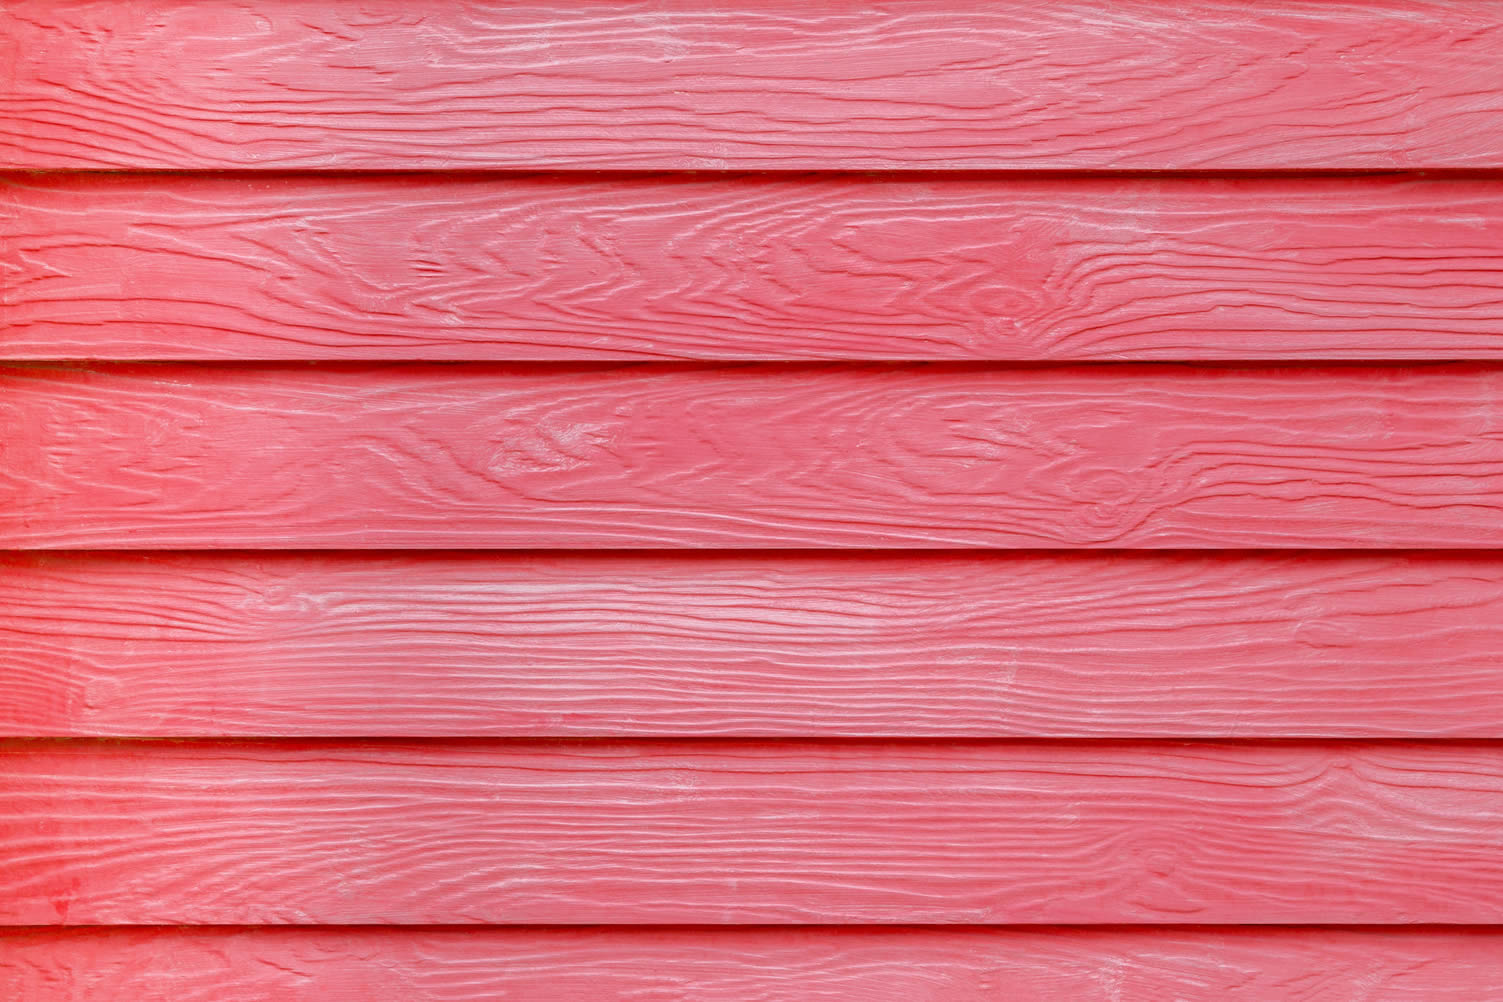 red fiber cement